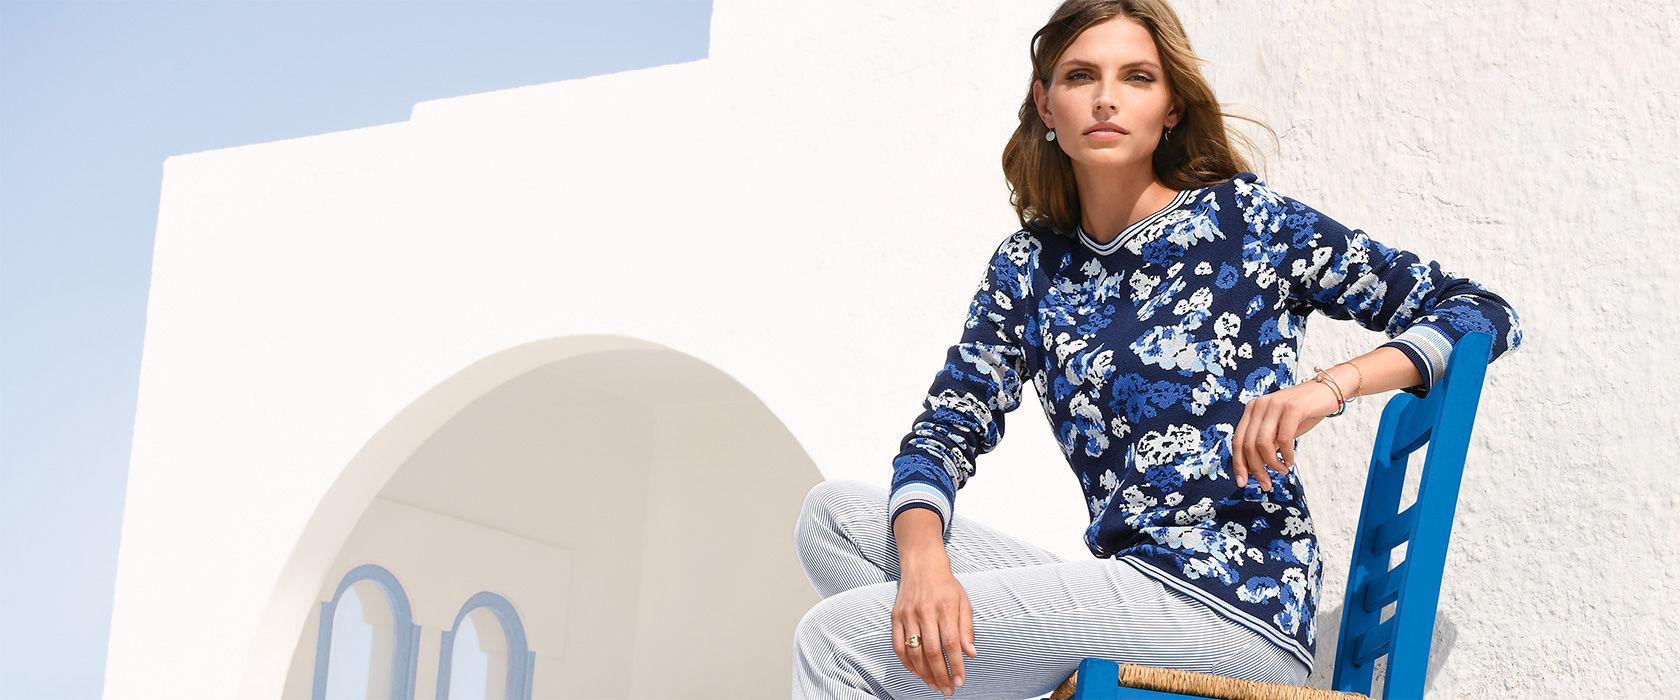 Hochwertige Damenmode exklusiver Mode-Designer   peterhahn.de d9fa6625f6